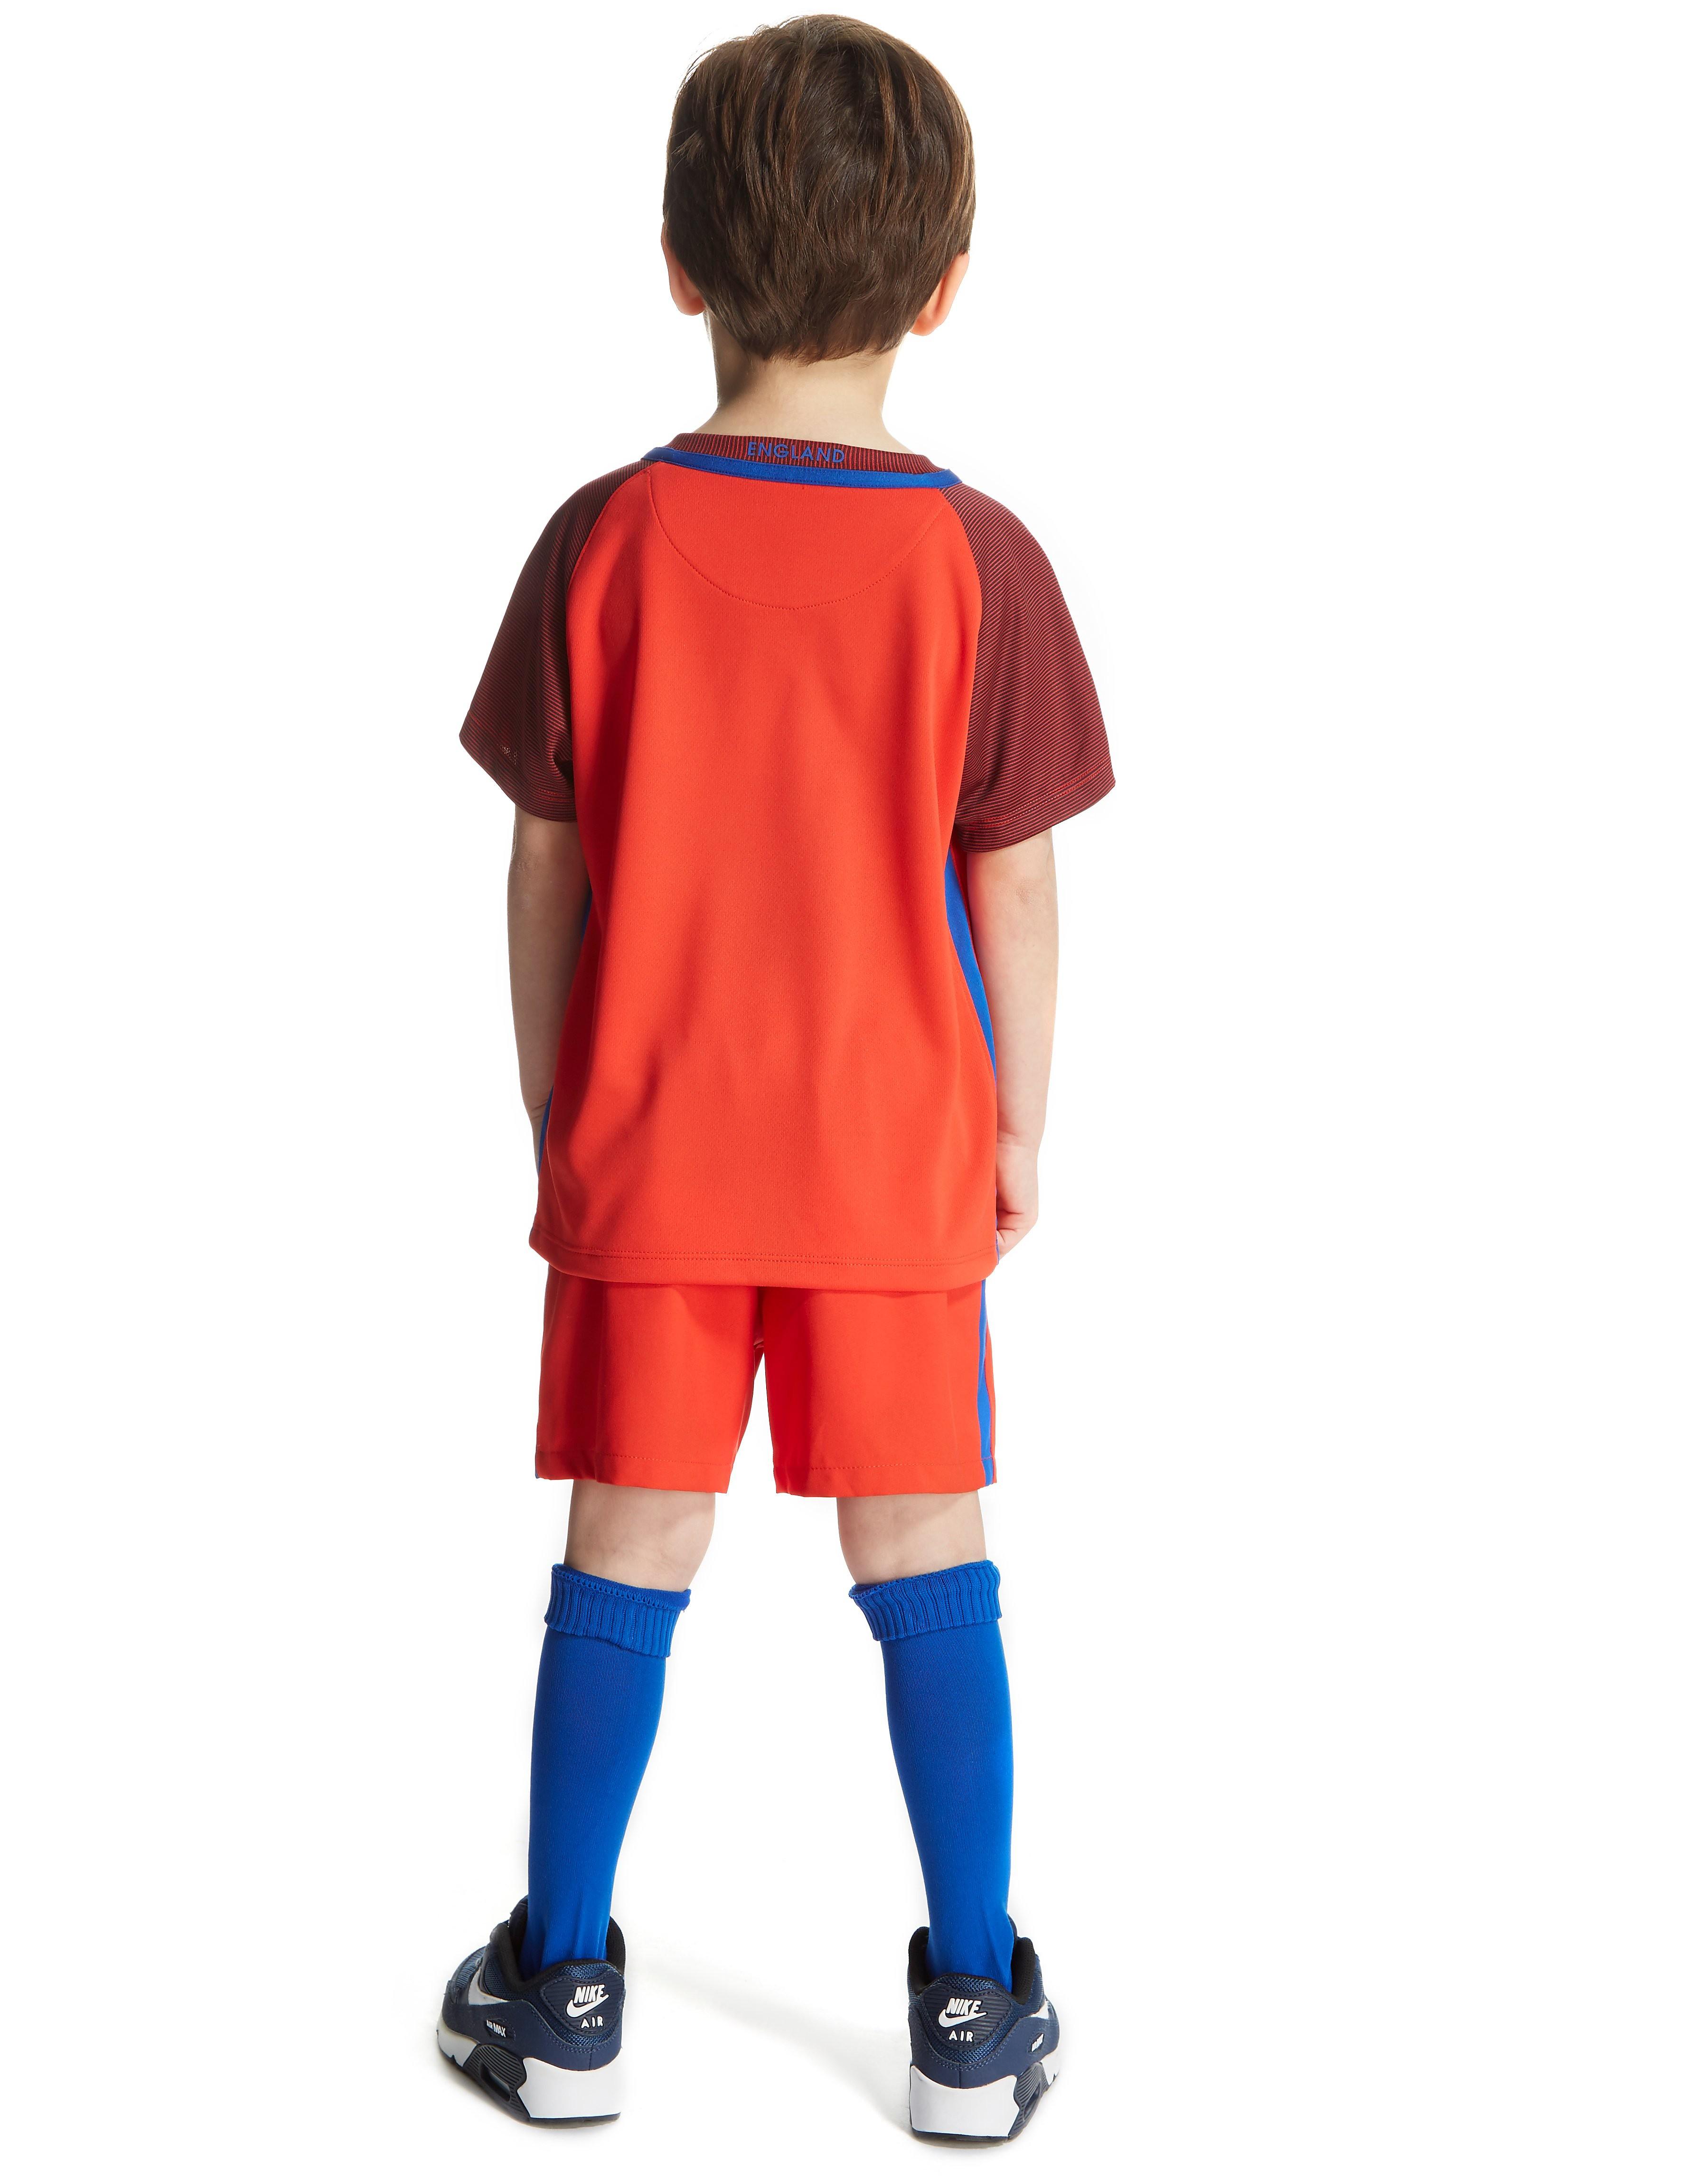 Nike England 2016 Away Kit Children